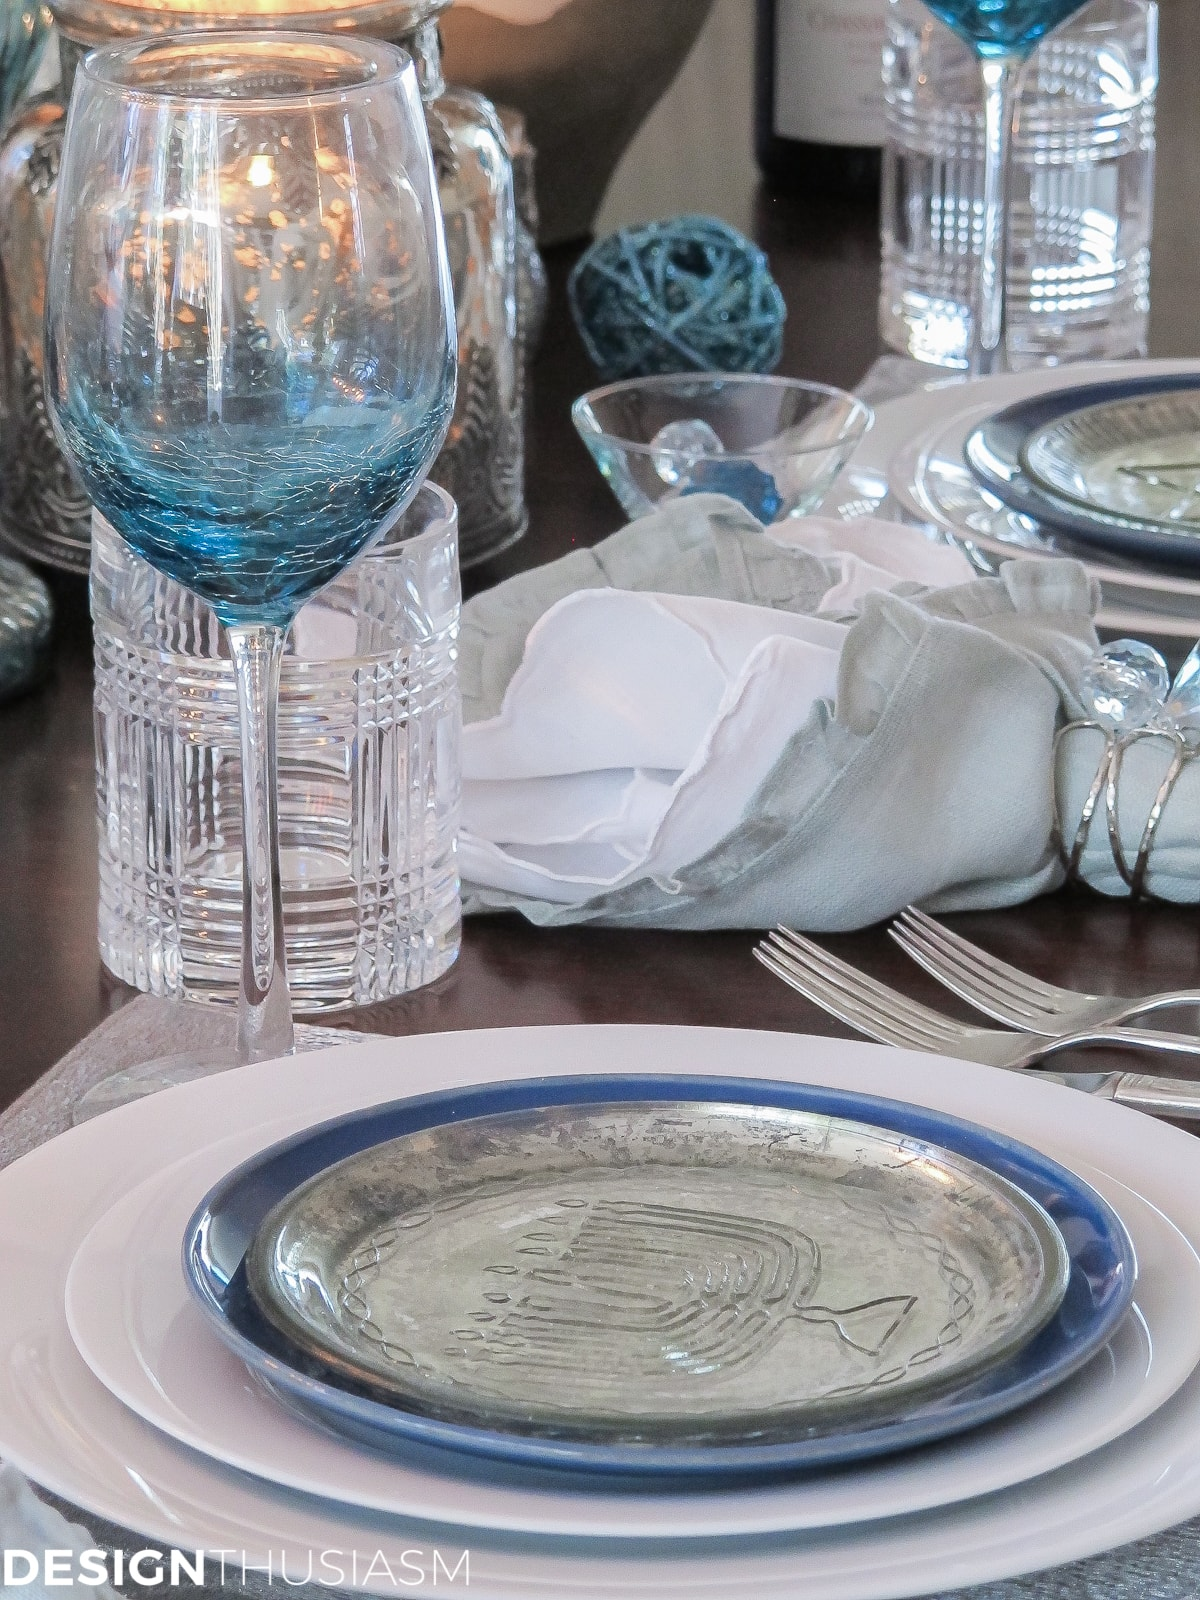 Festival of Lights Hanukkah Table Setting | Designthusiasm.com & Candlelit Festival of Lights Hanukkah Table Setting